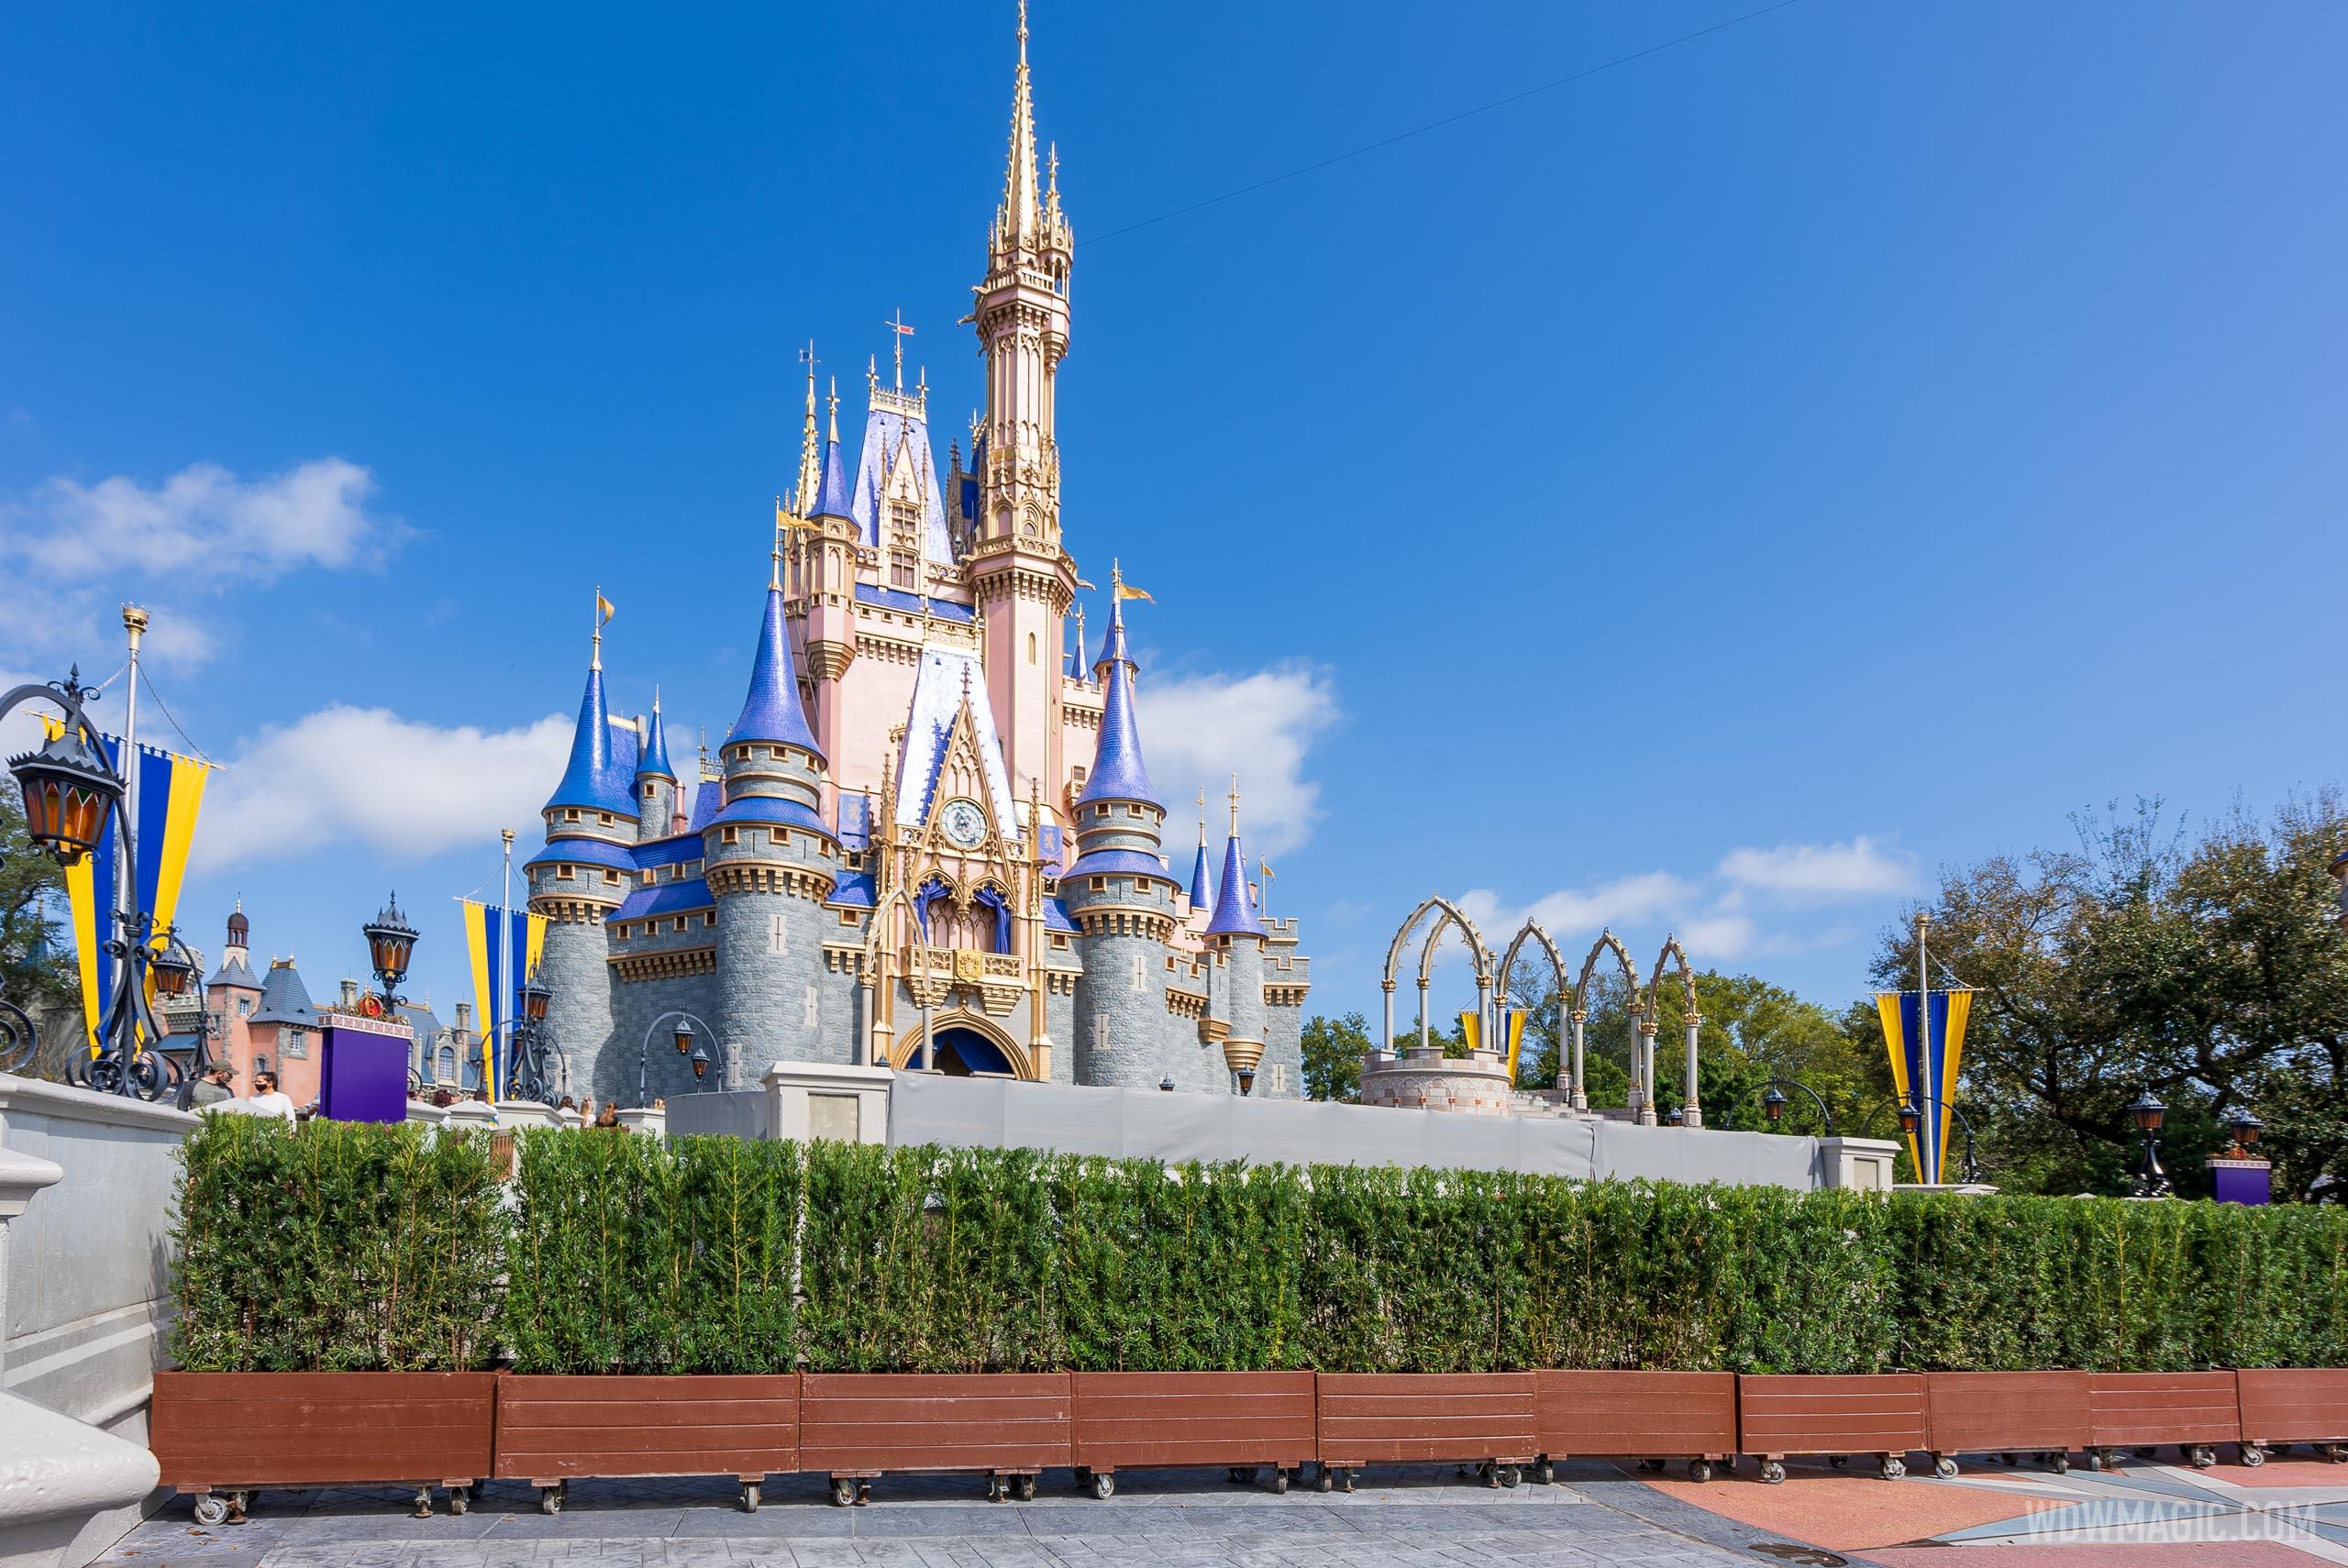 Cinderella-Castle_Full_40909.jpg